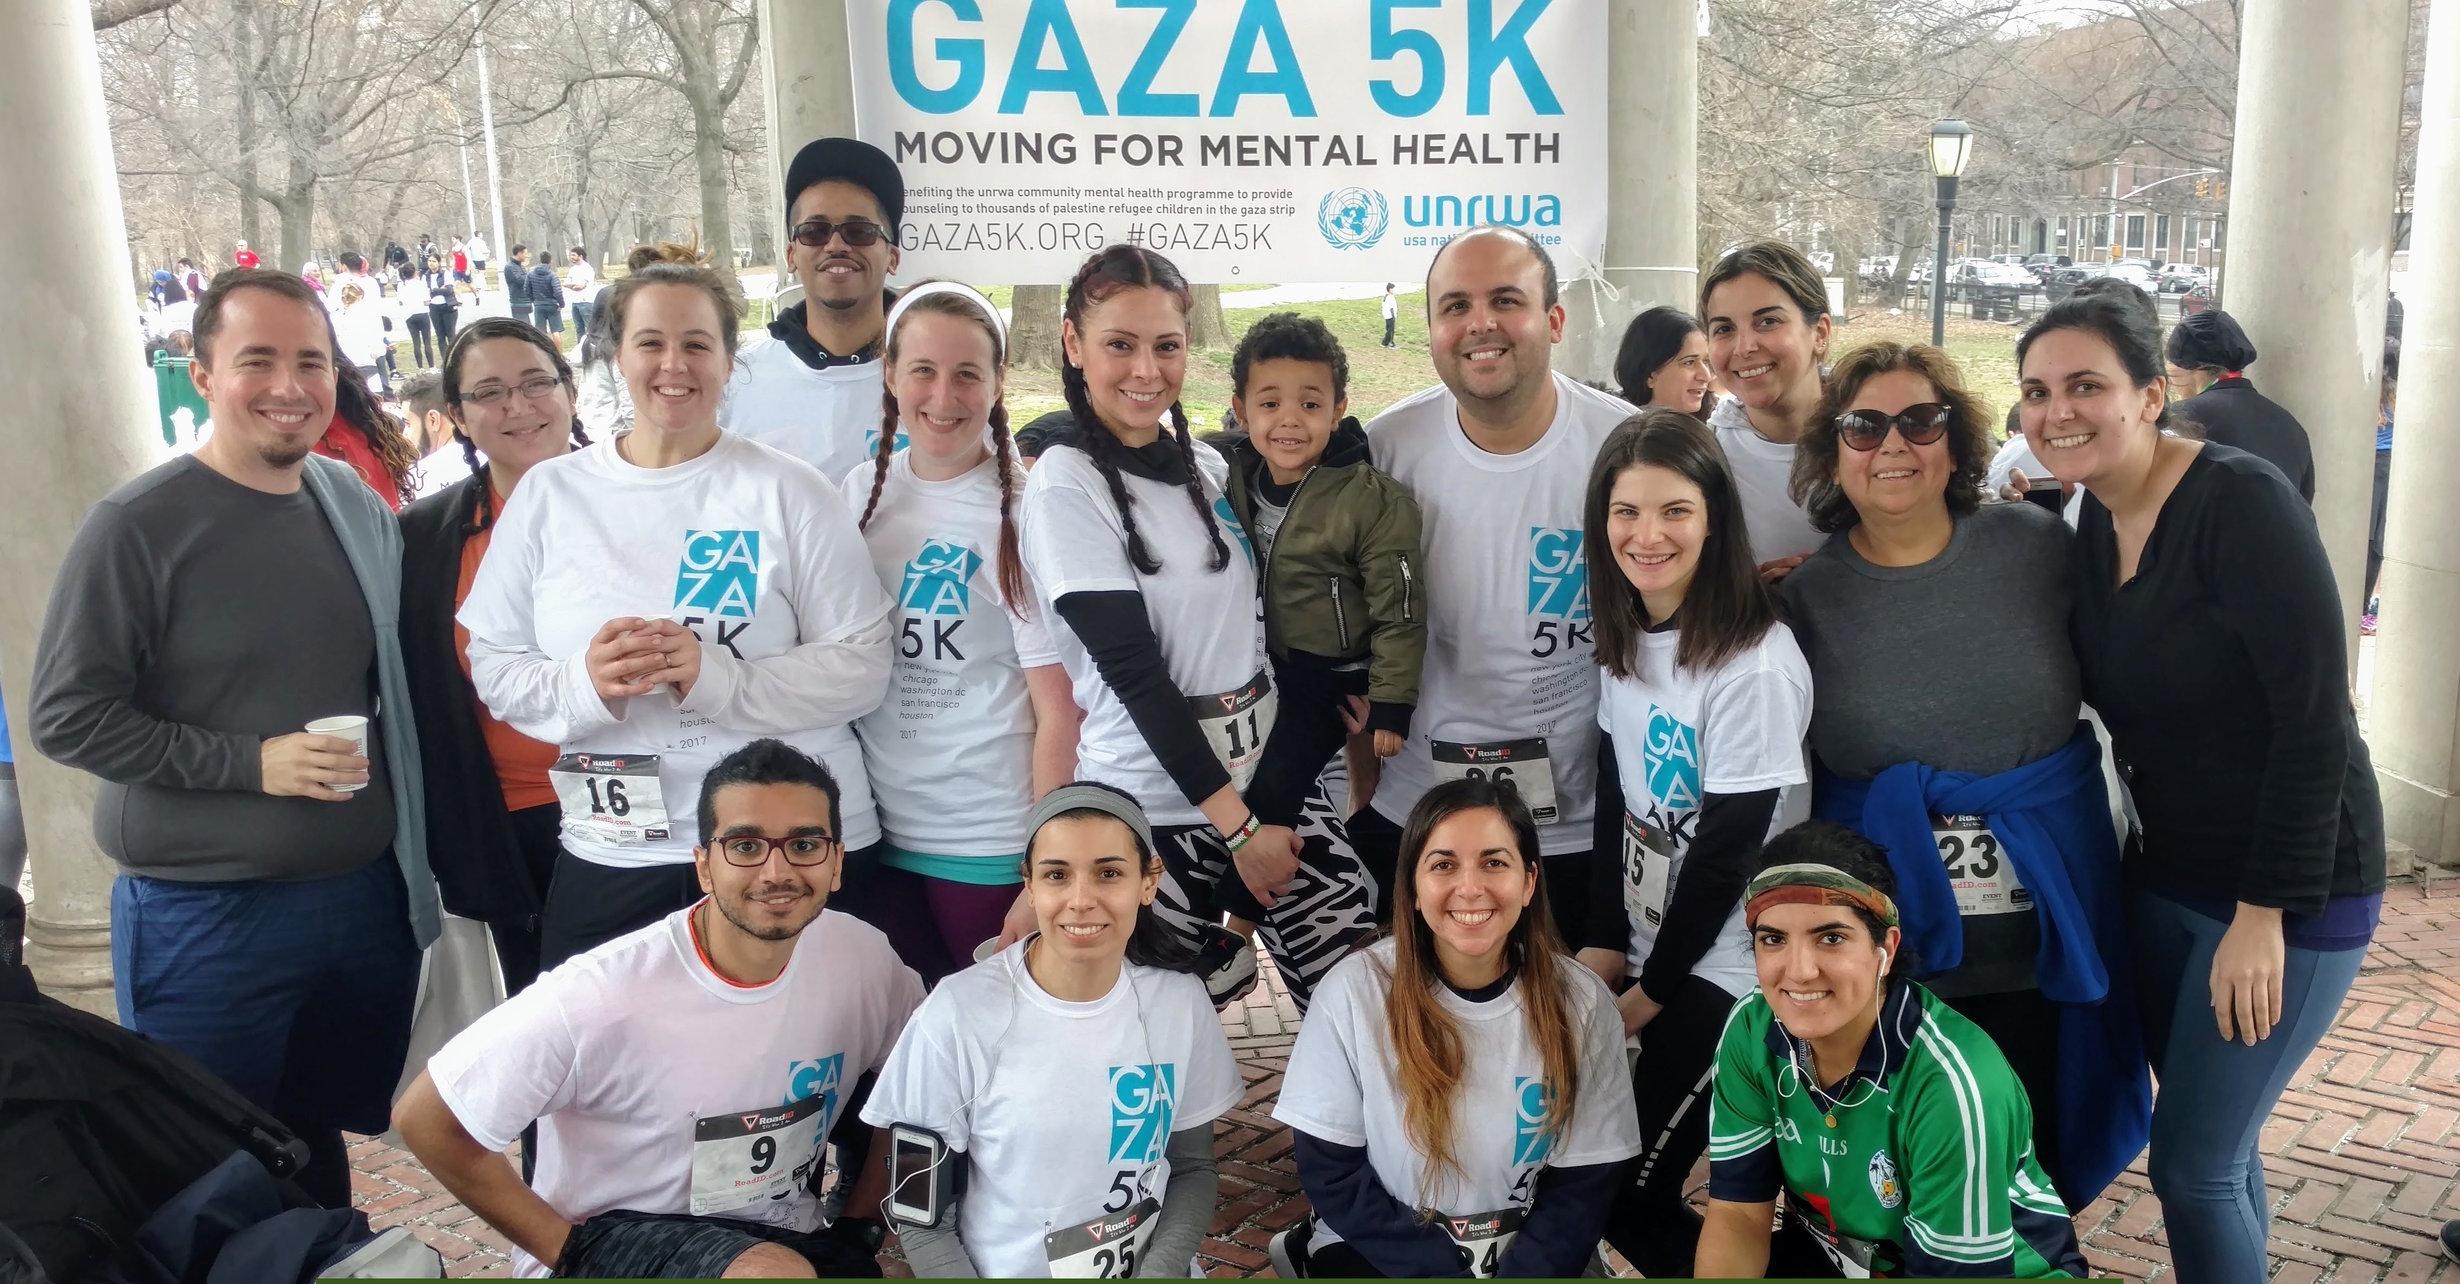 voices of the 2018 nyc gaza 5k: team olive gaza | 3.6.2018